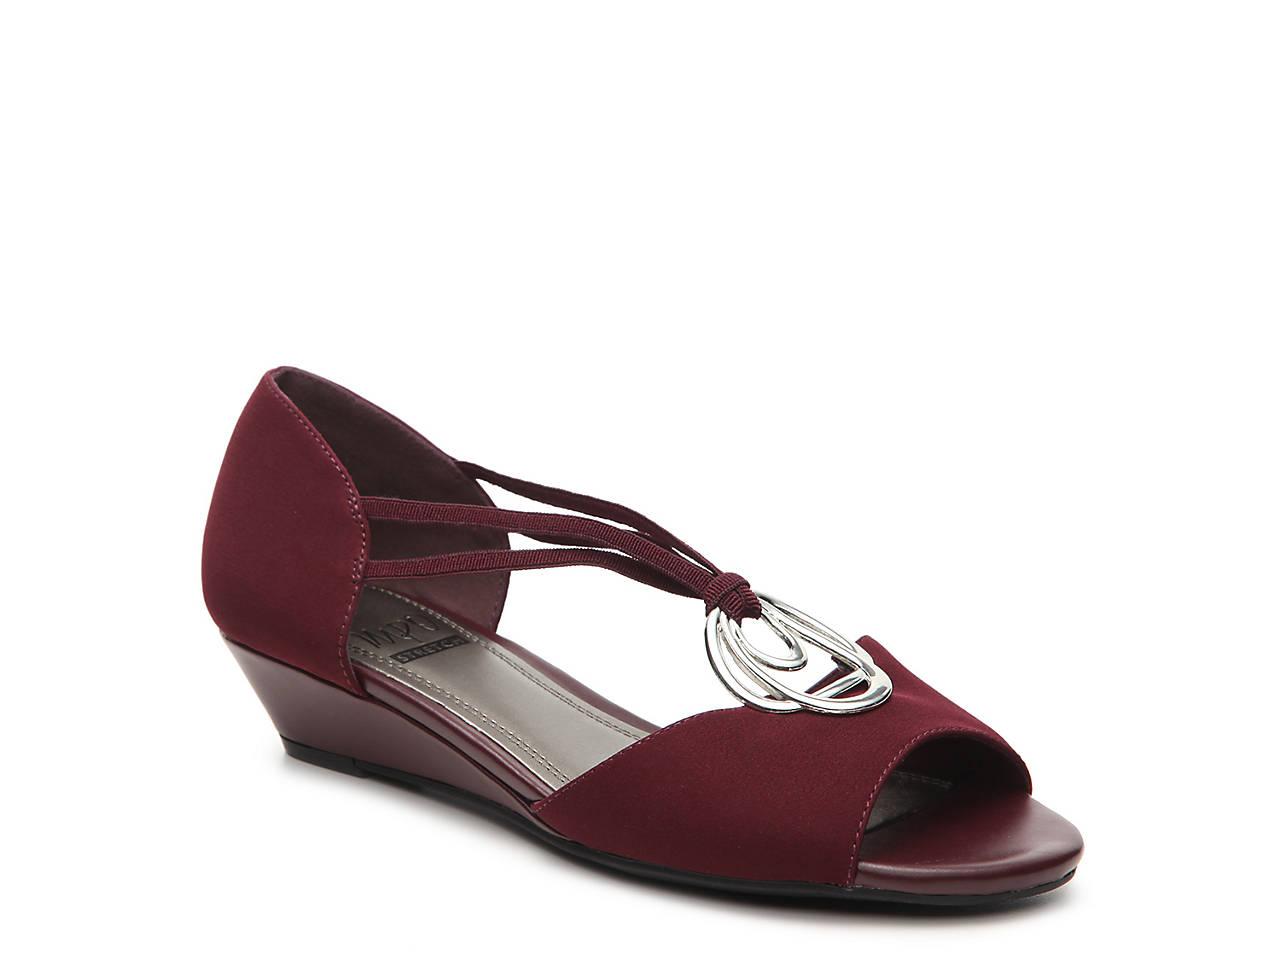 f24c46f7047 Regis Wedge Sandal